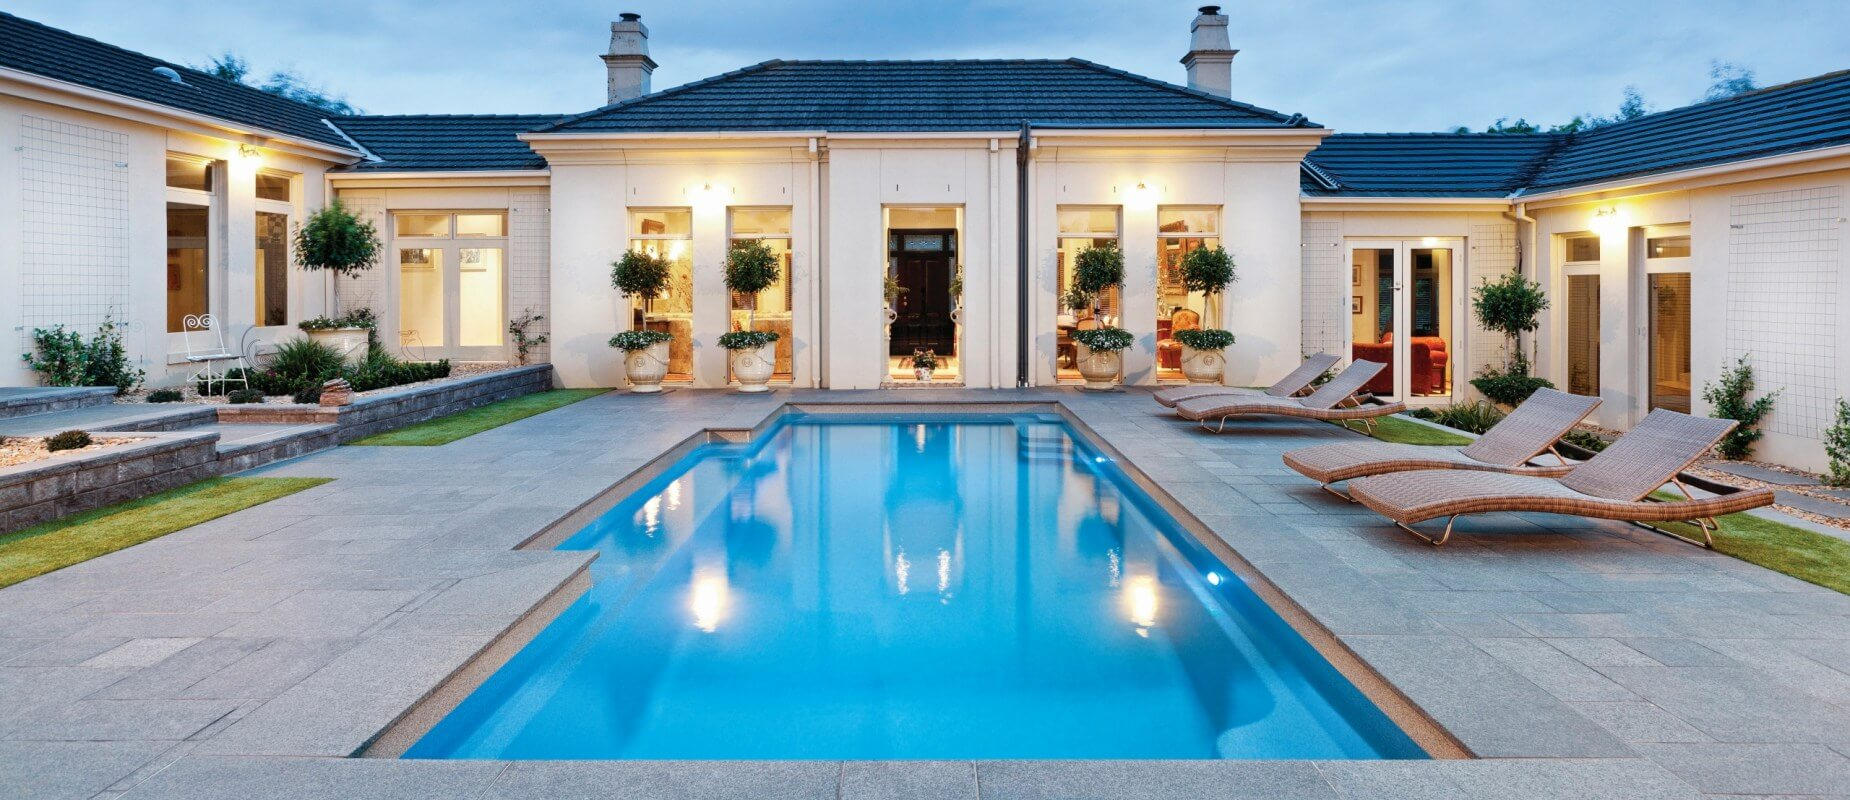 piscina de lux modele frumoase 0